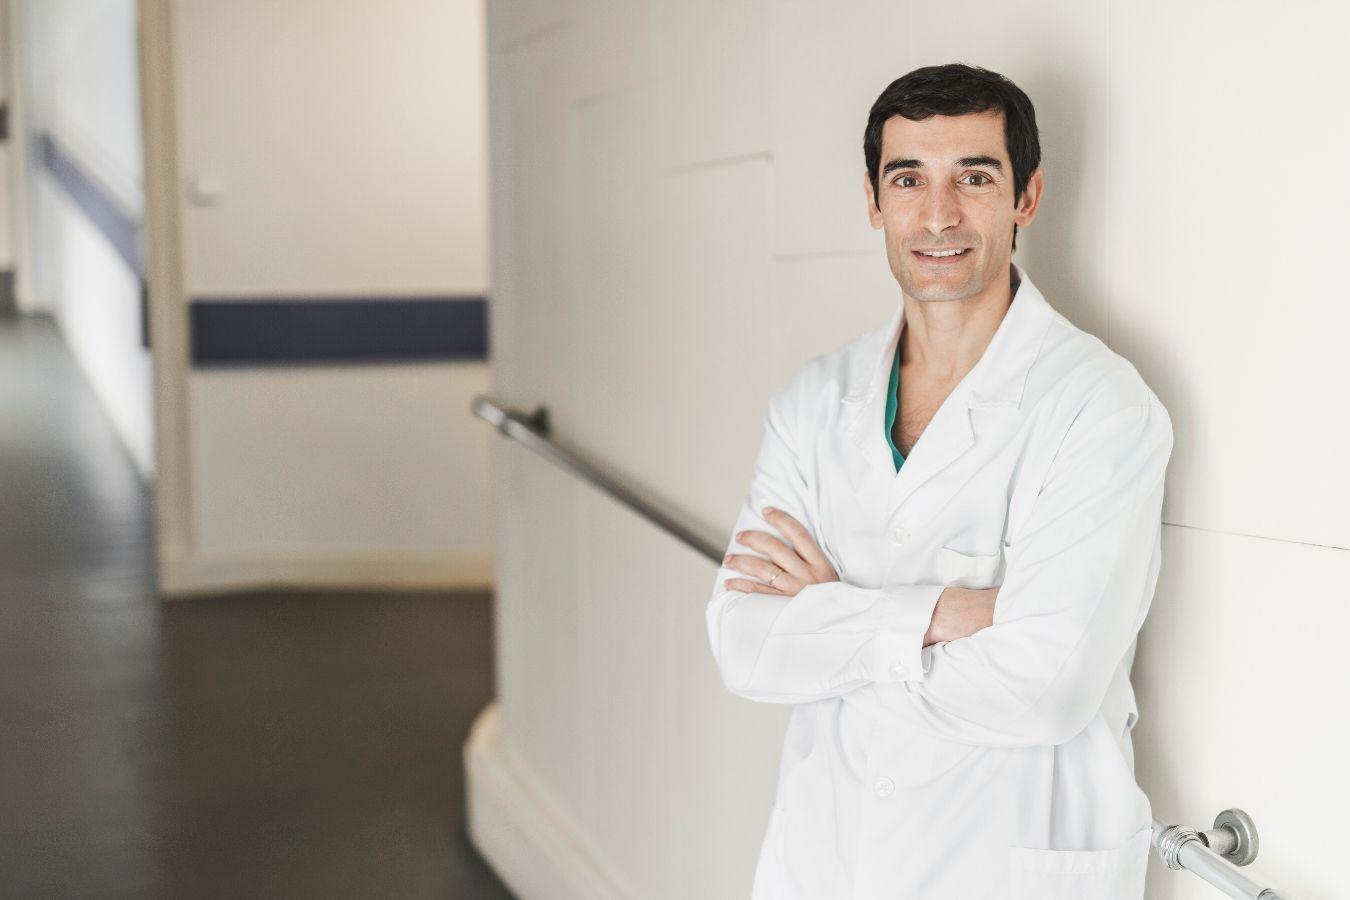 fibromiomas uterinos - Dr. Tiago Bilhim